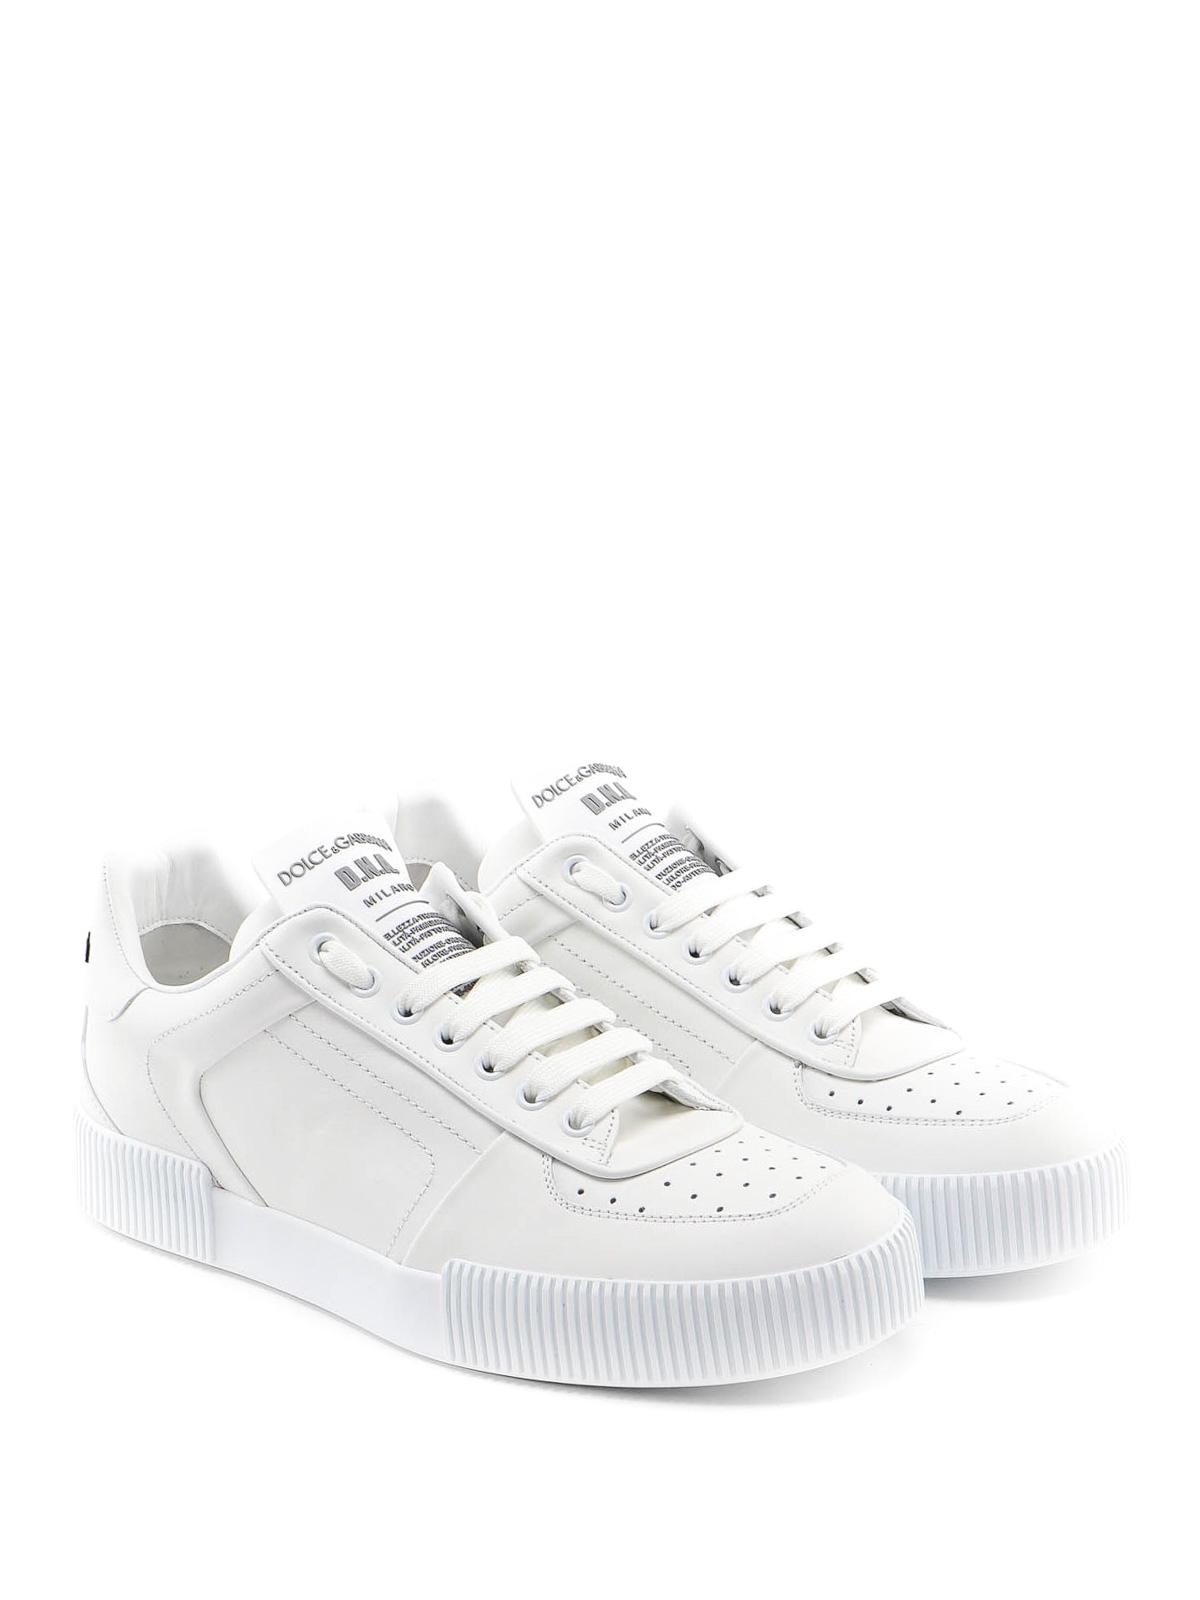 Gabbana - Miami white nappa sneakers